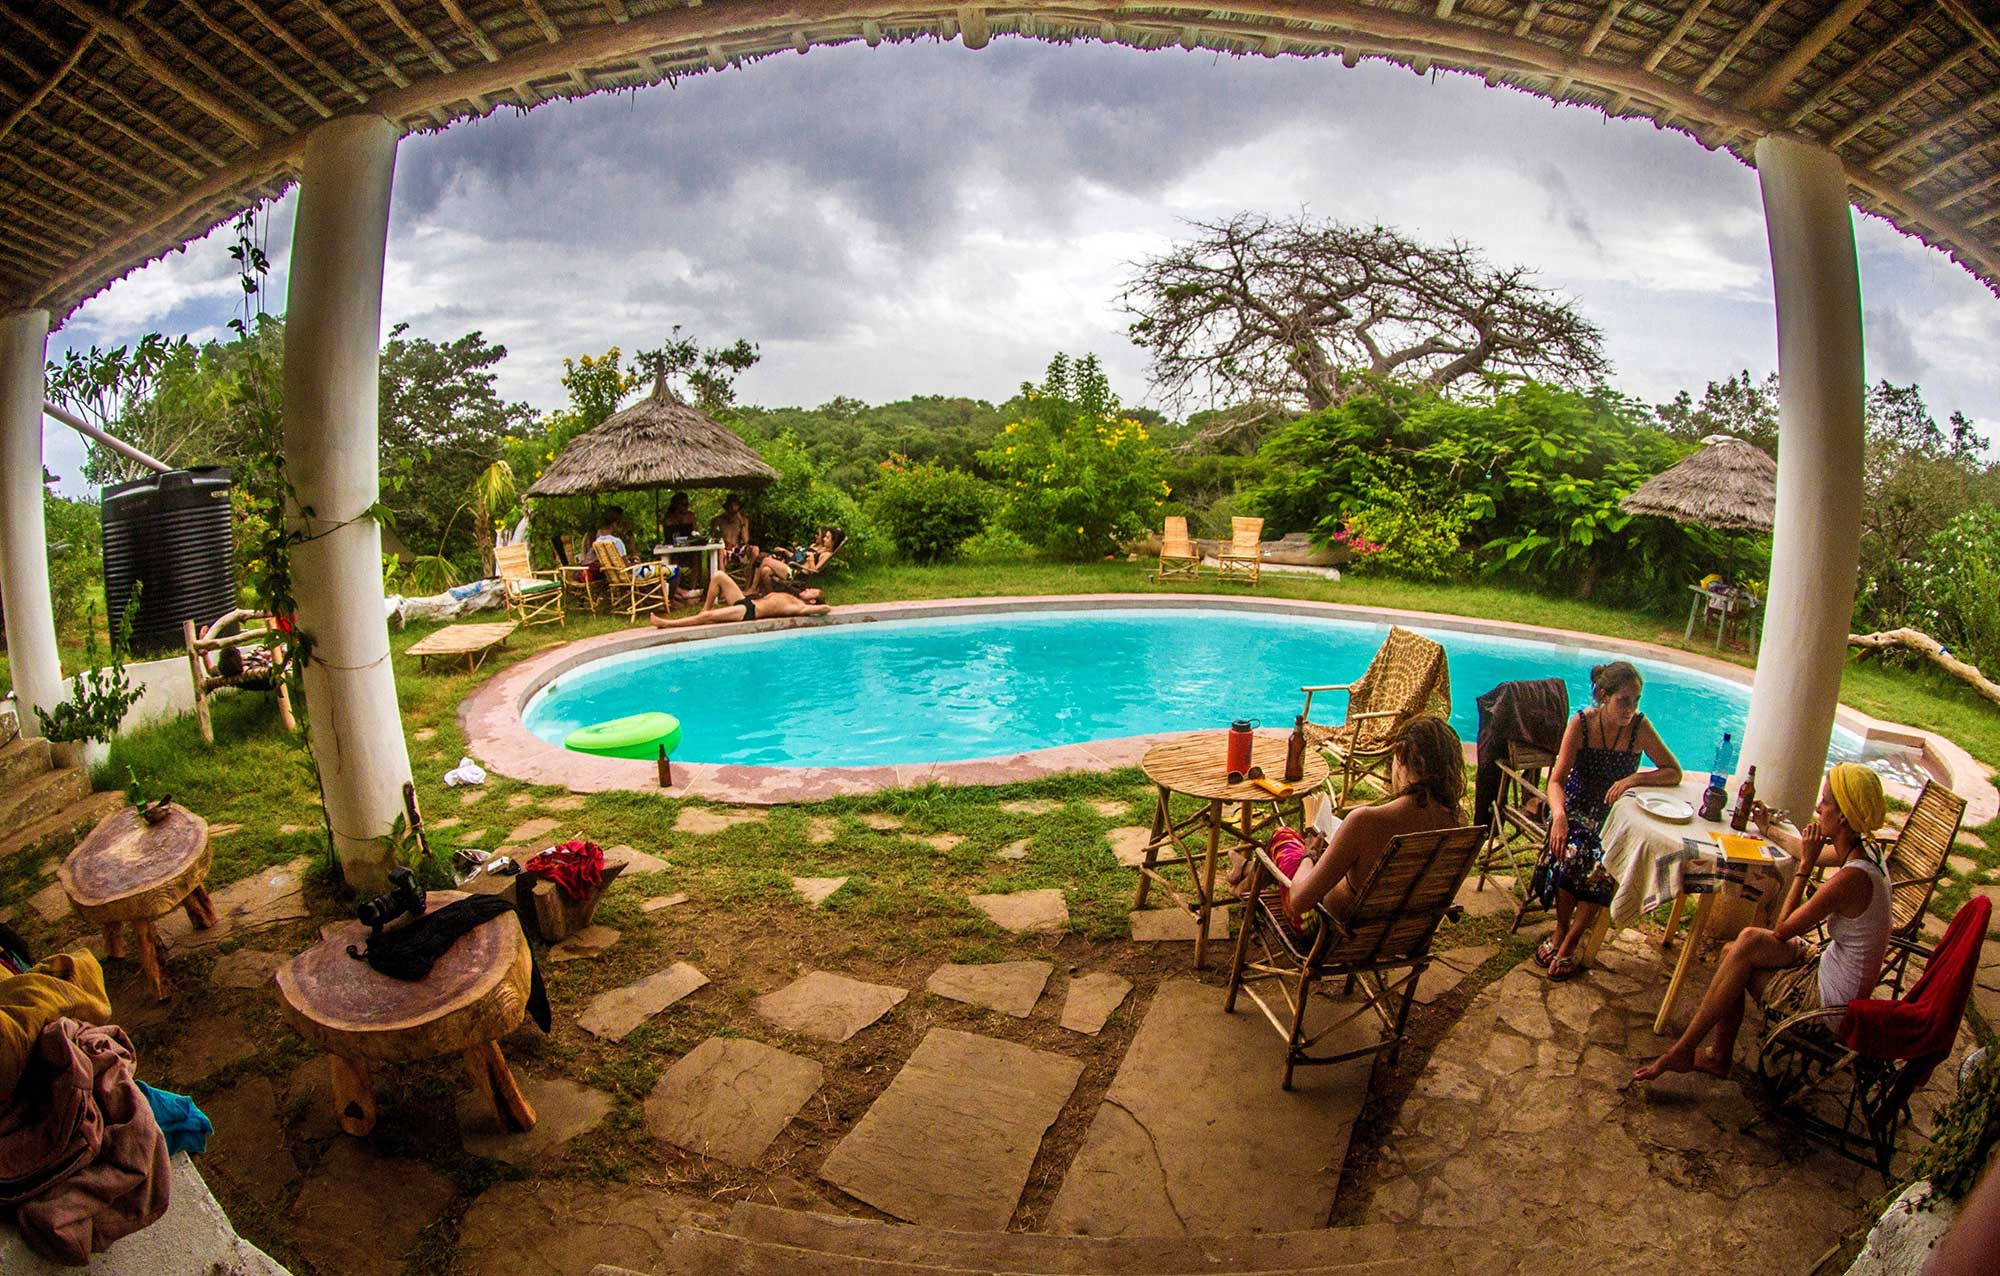 The Distant Relative Lodge, image source; kenya-coast.com